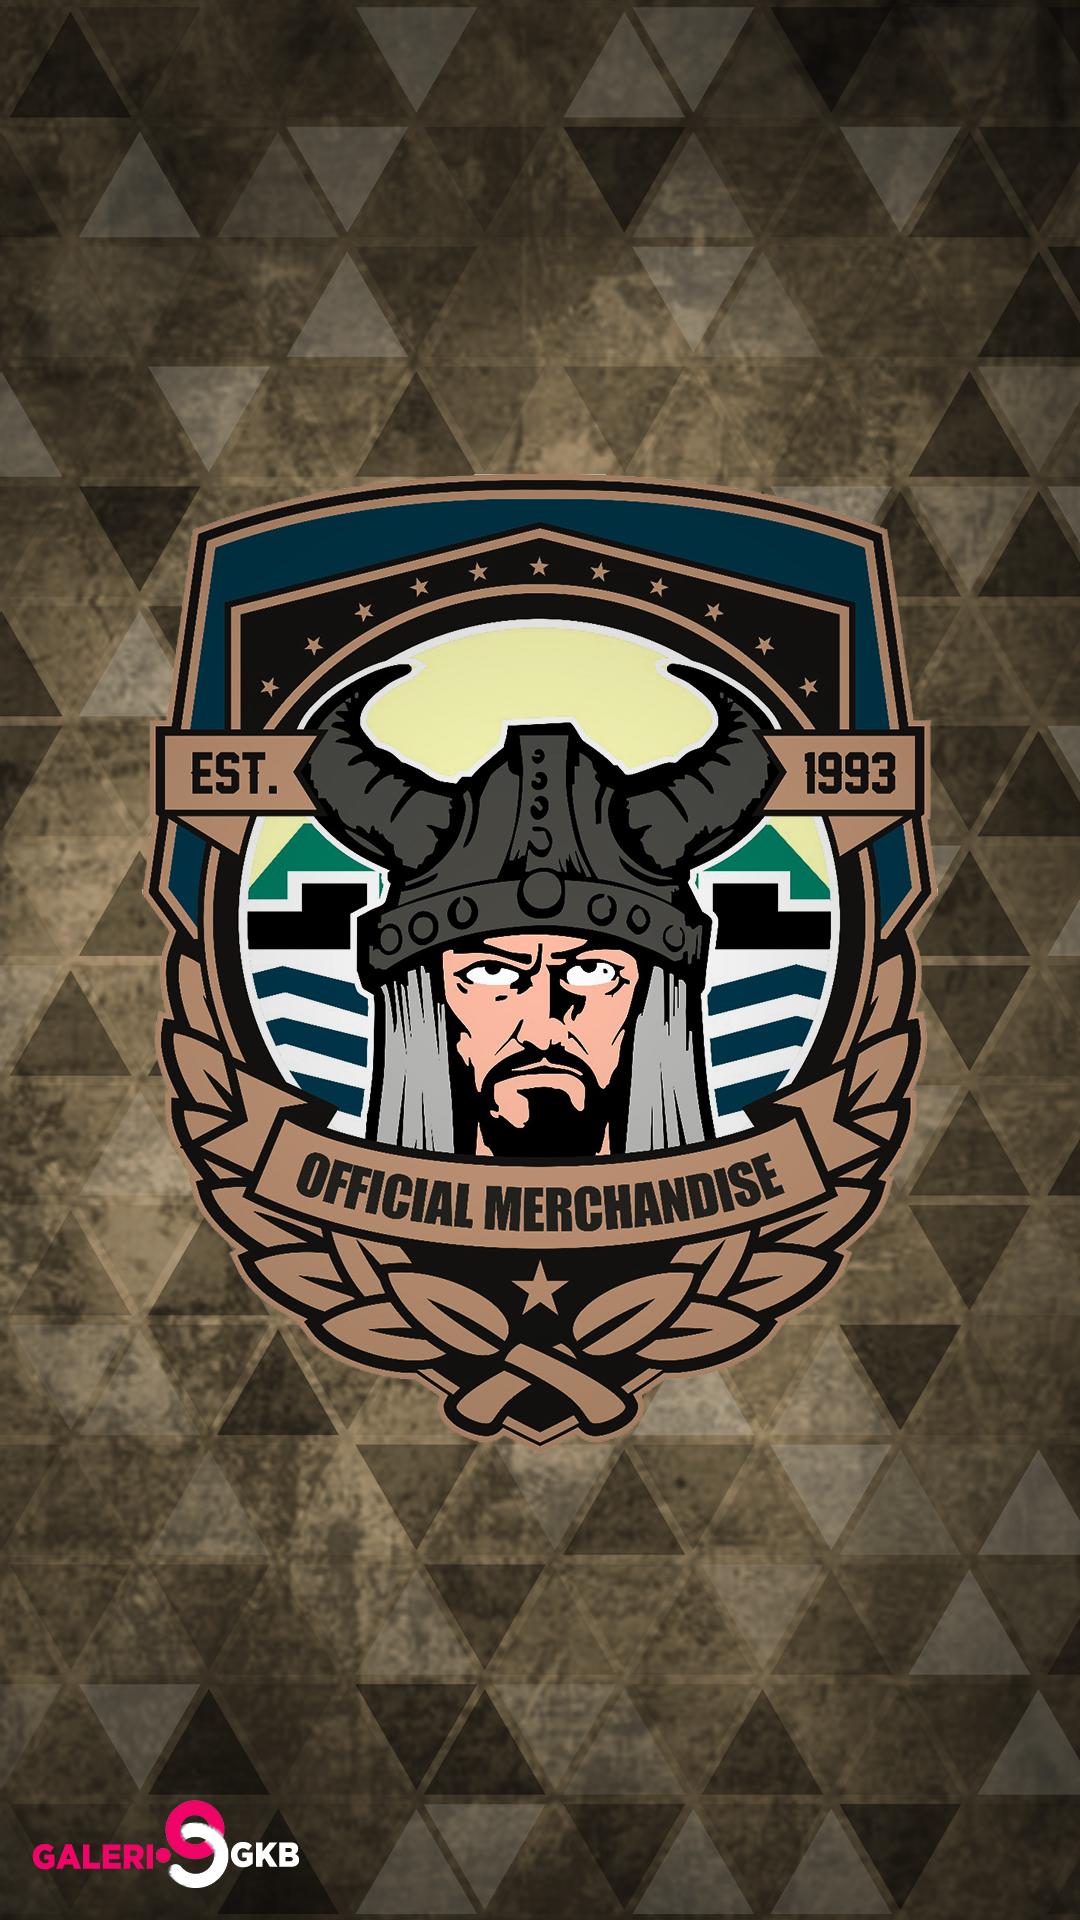 Viking Bobotoh Persib Bandung Kumpulan Gambar Wallpaper Viking Persib Bobotoh Persib Terbaru